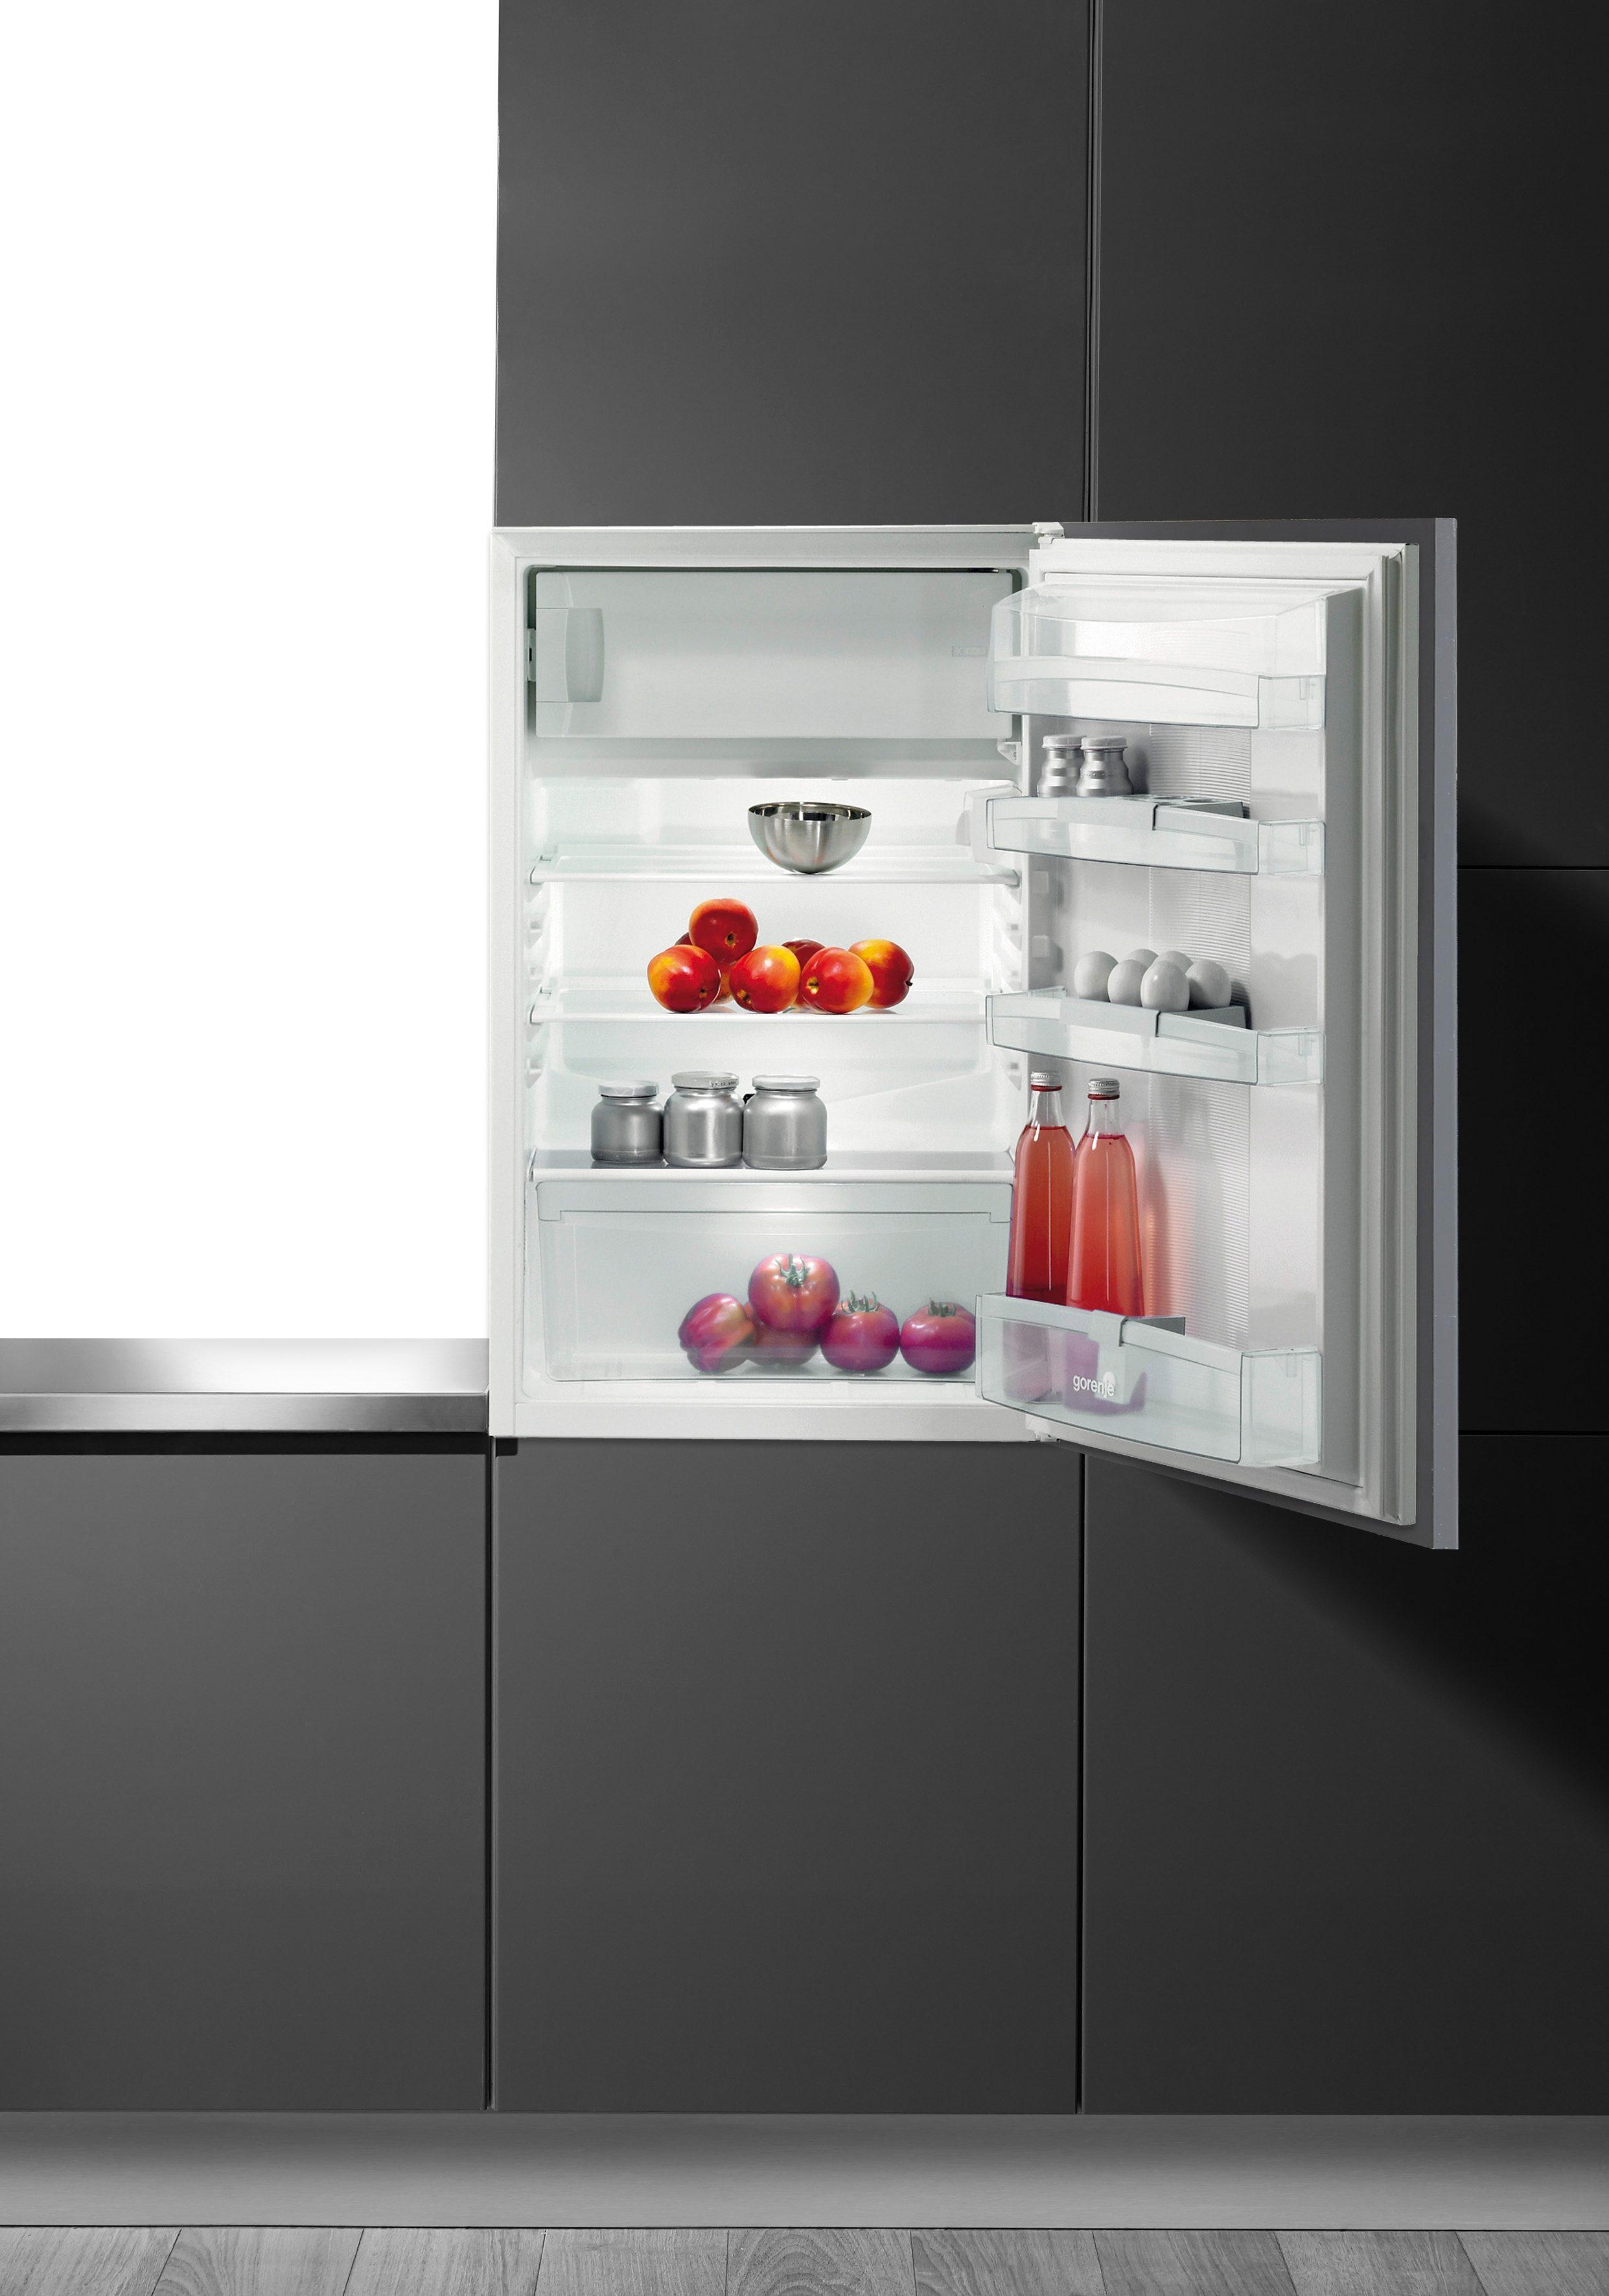 Gorenje integrierbarer Einbau-Kühlschrank »RBI 4092 AW«, A++, 88 cm